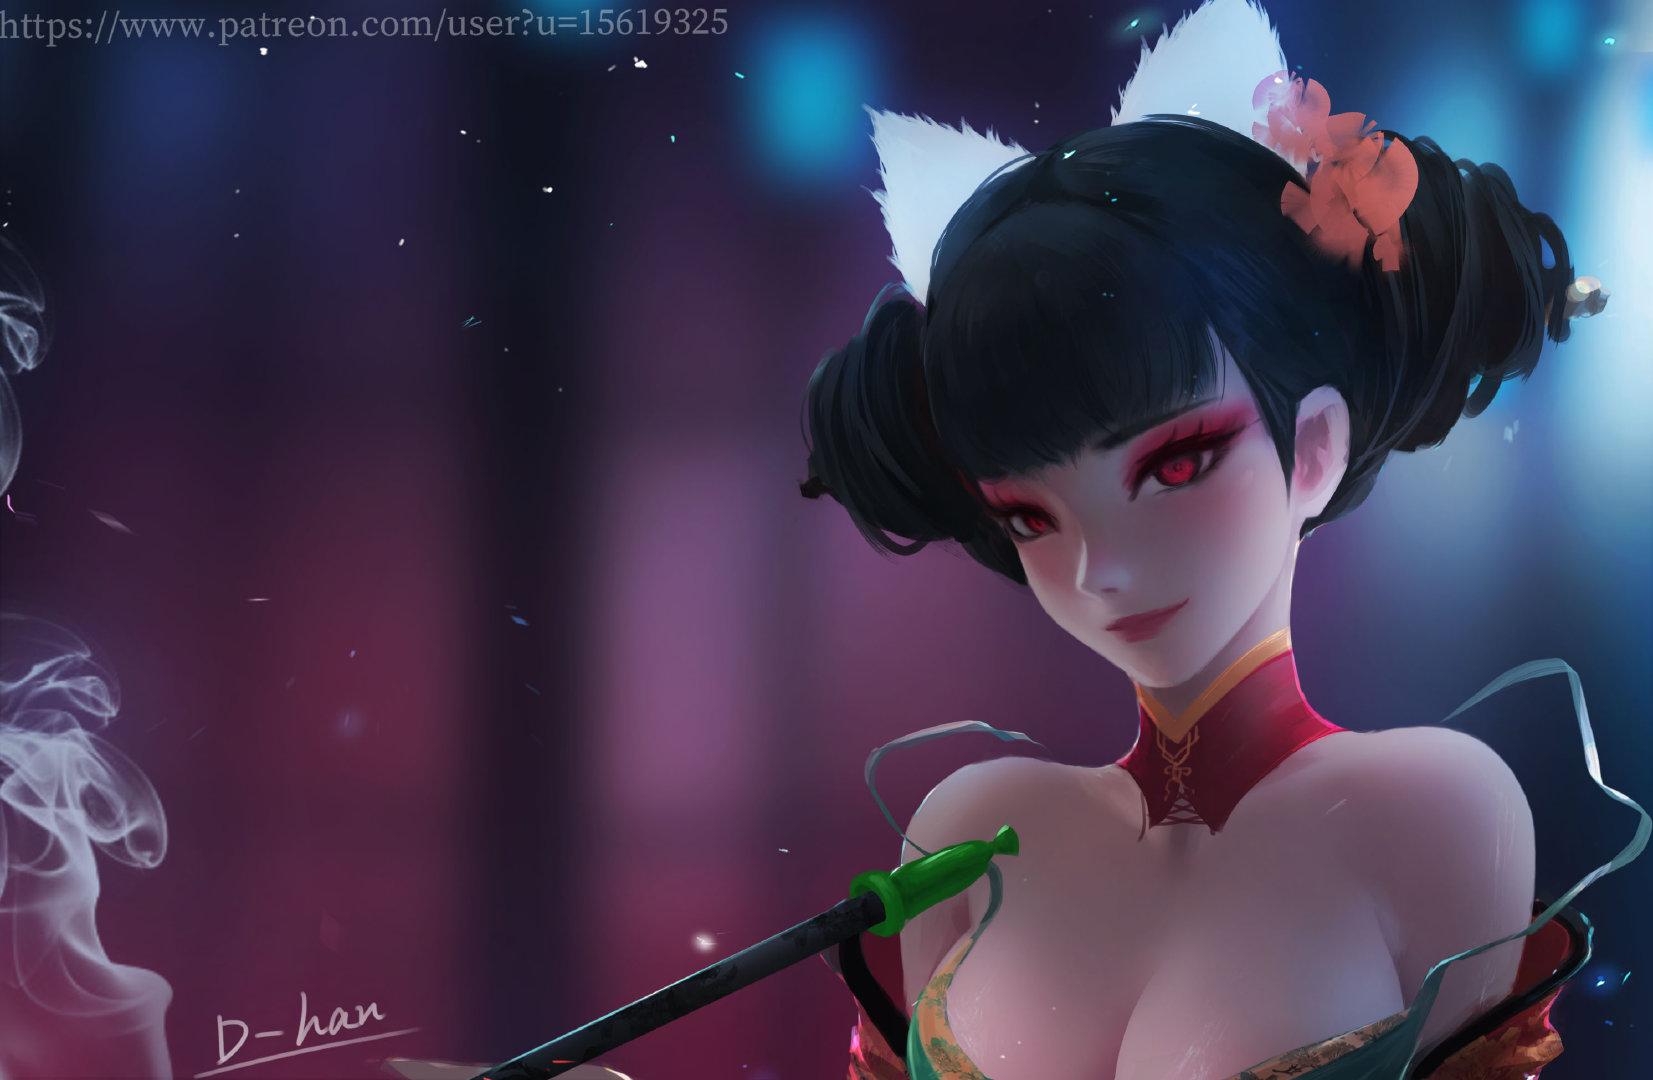 p站帝寒(d-han)is creating 绘画同人图下载